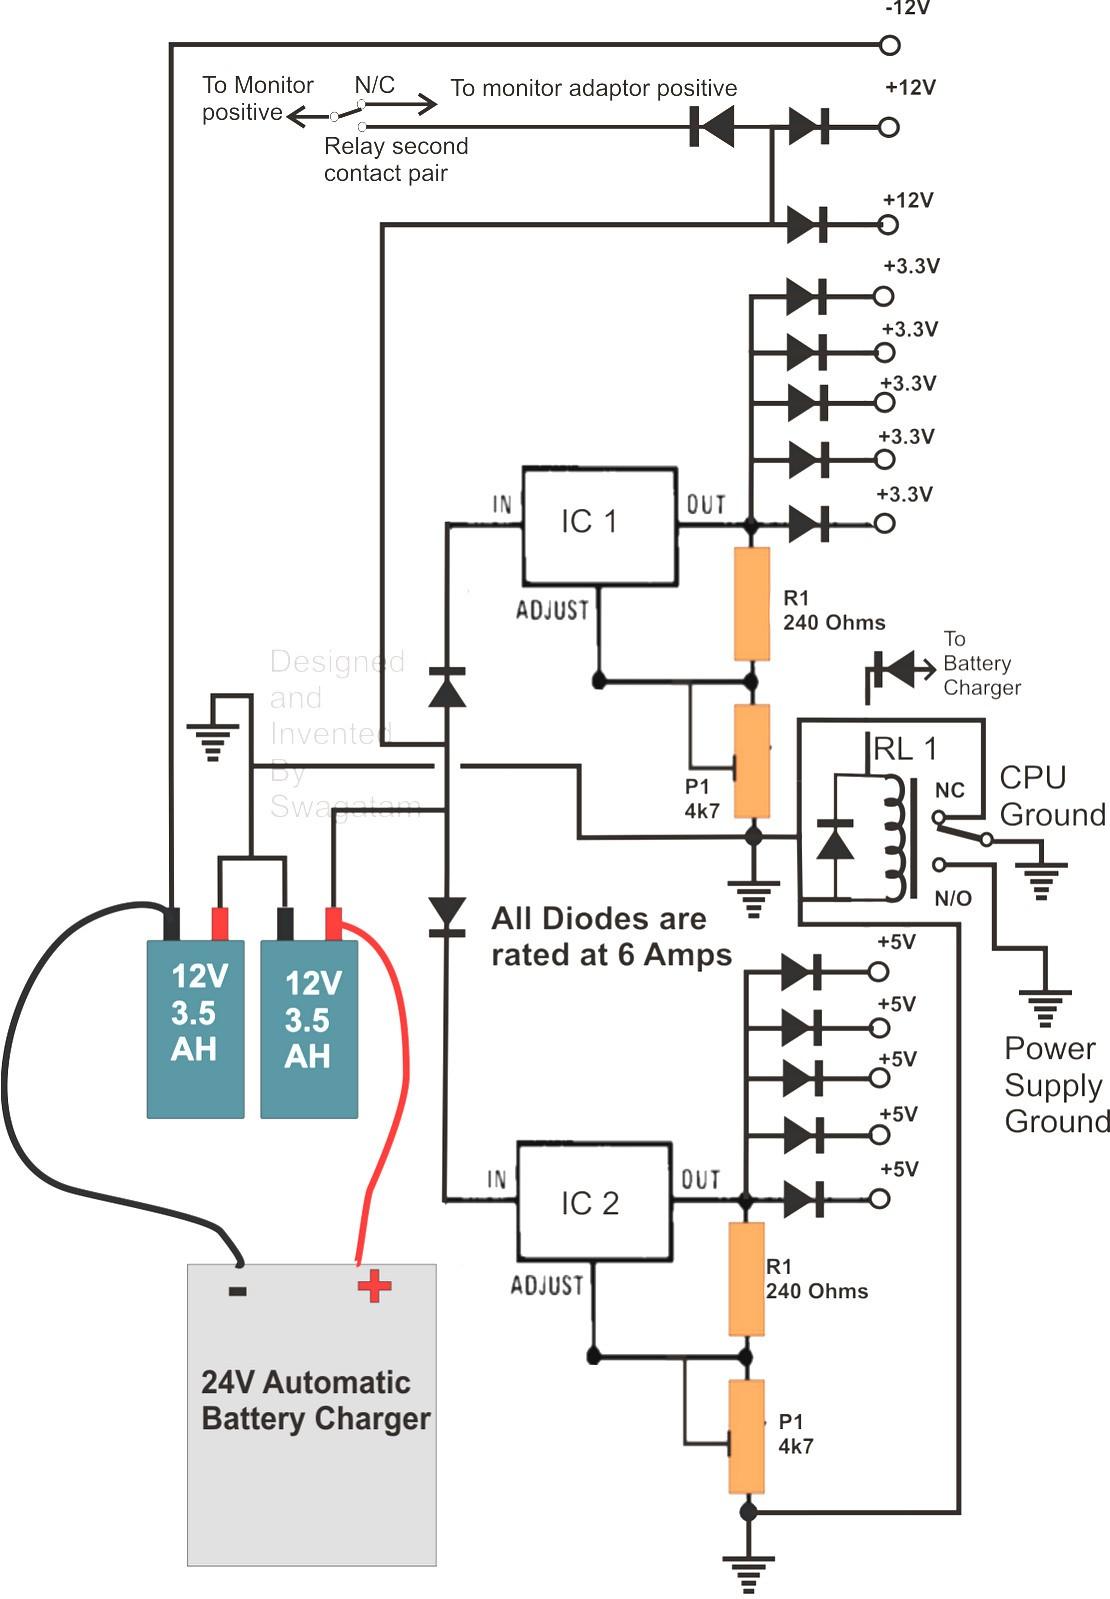 Saab Harmon Cardon Wiring Diagram